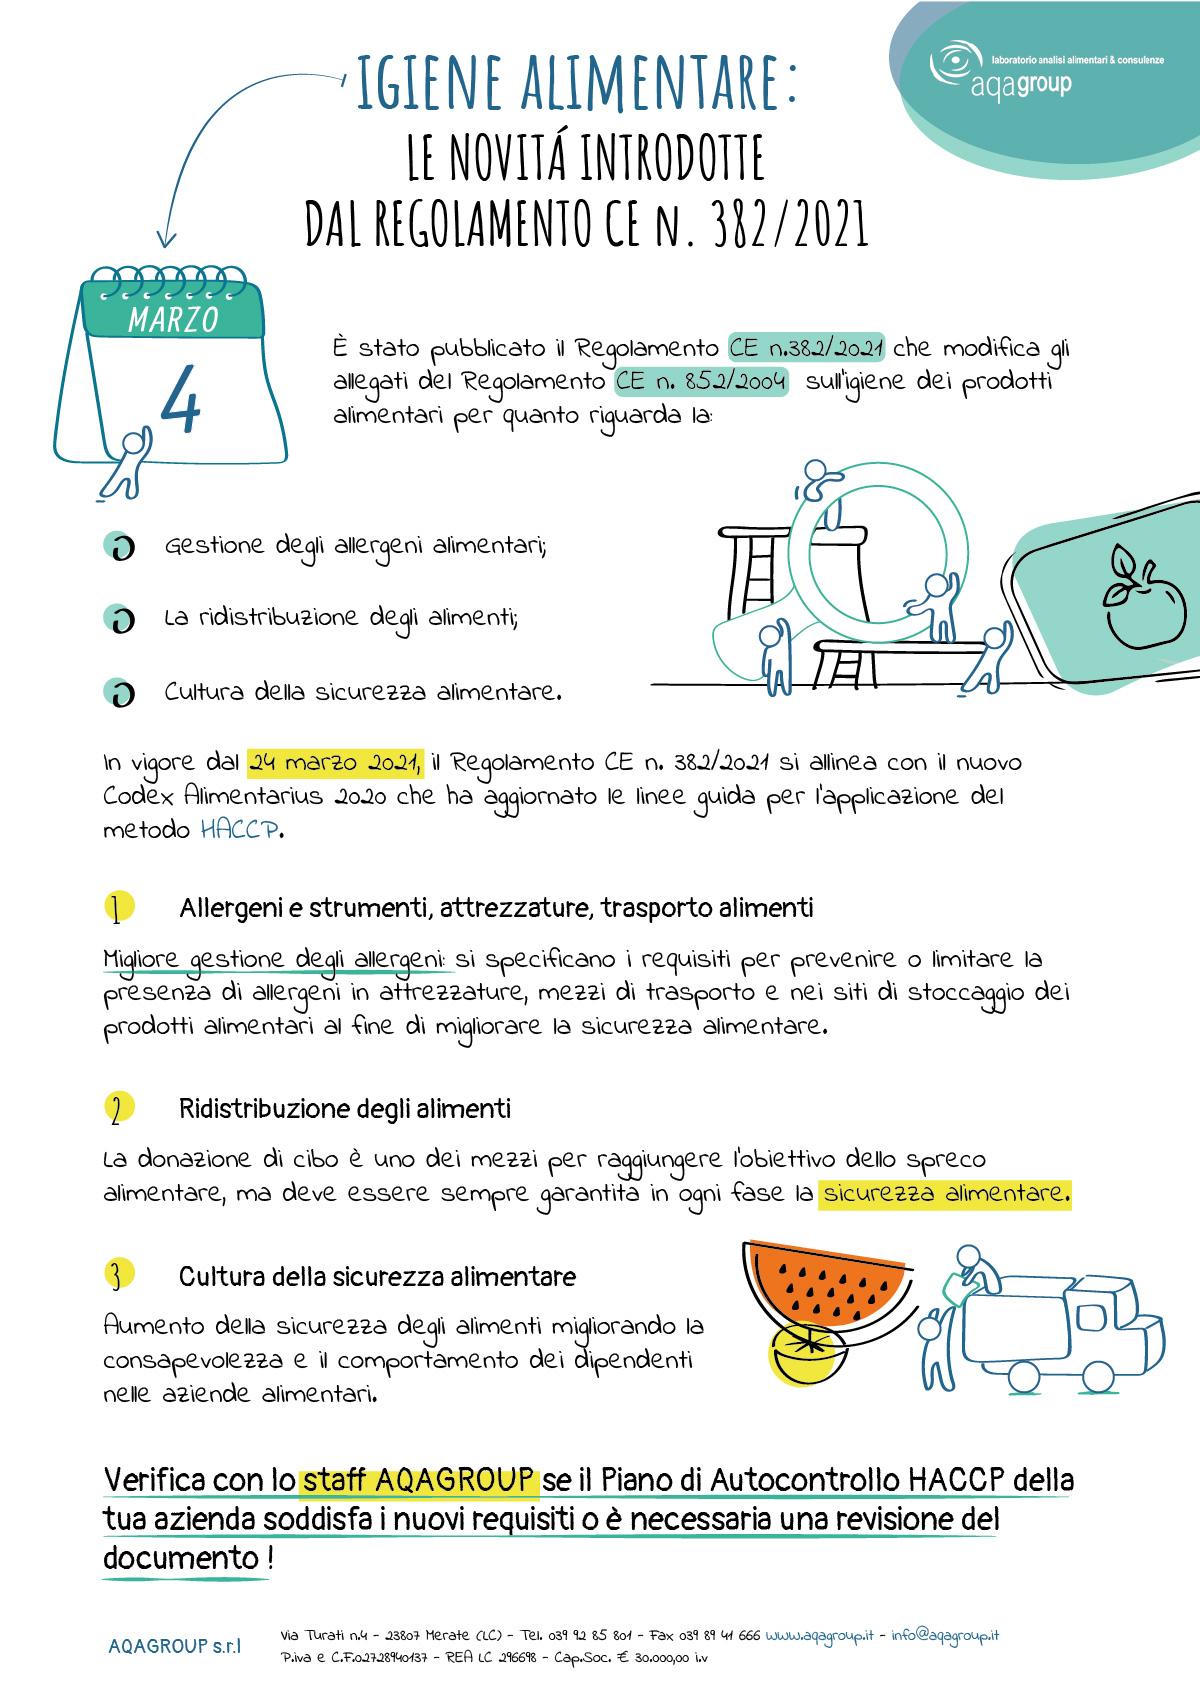 regolamento-novita-aqagroup-382-2021